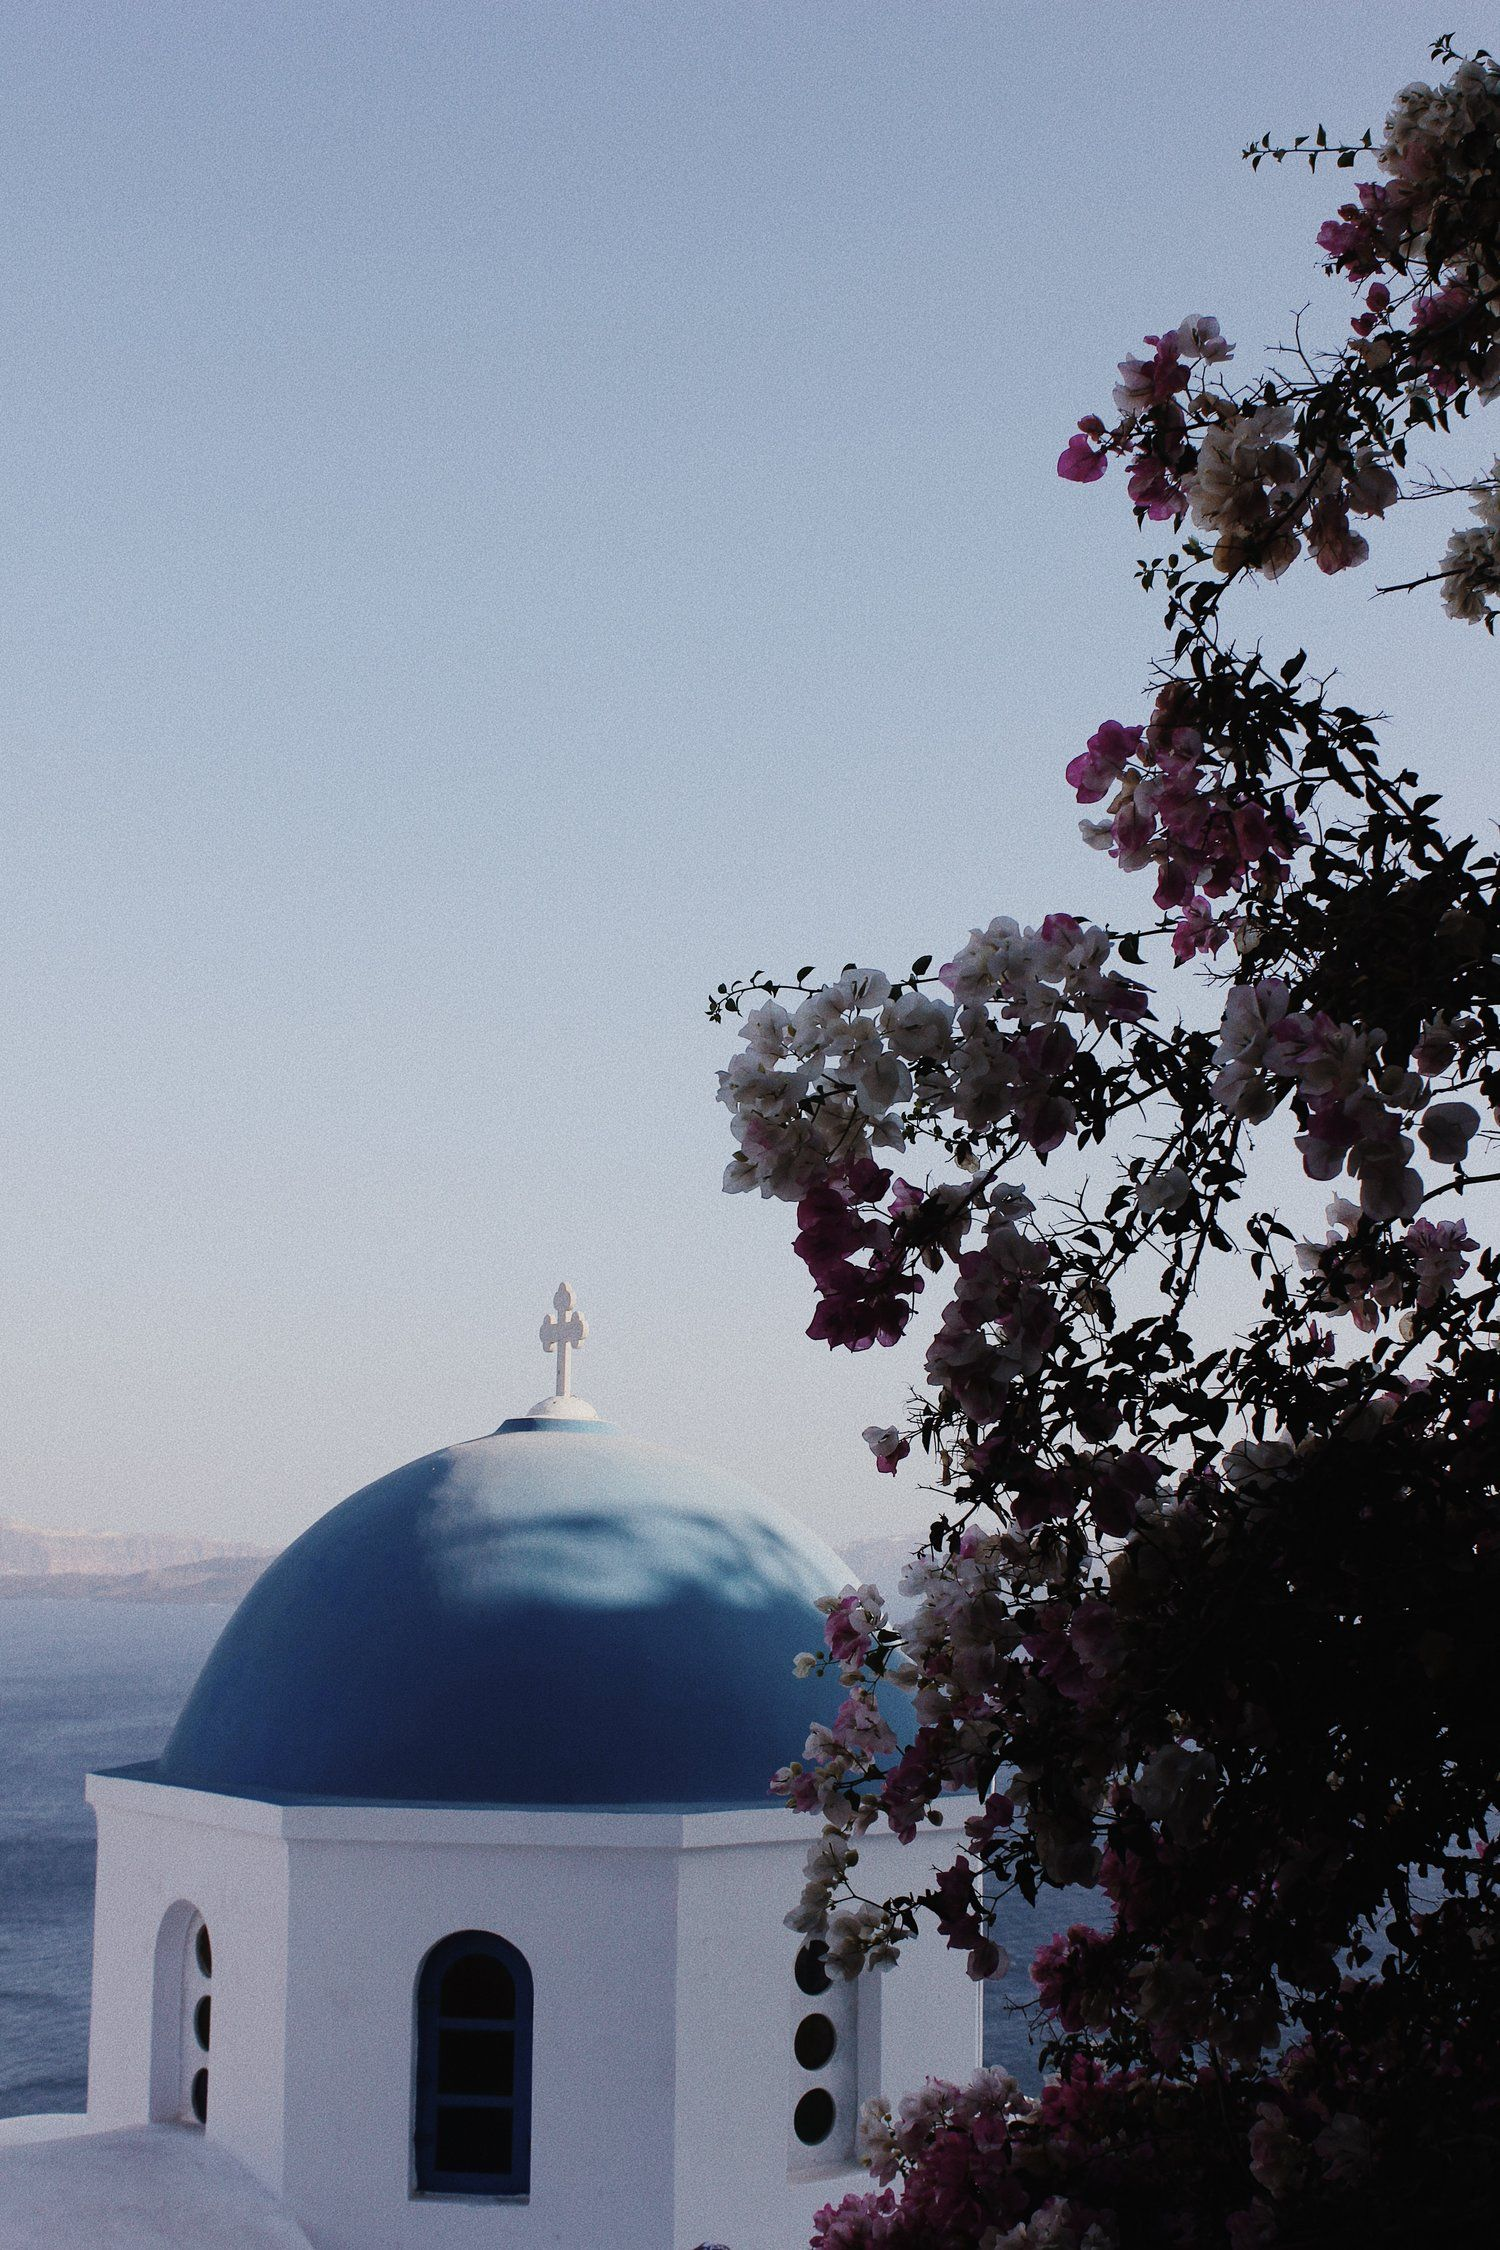 Travel Guide: Santorini   Travel guide, Santorini, Travel